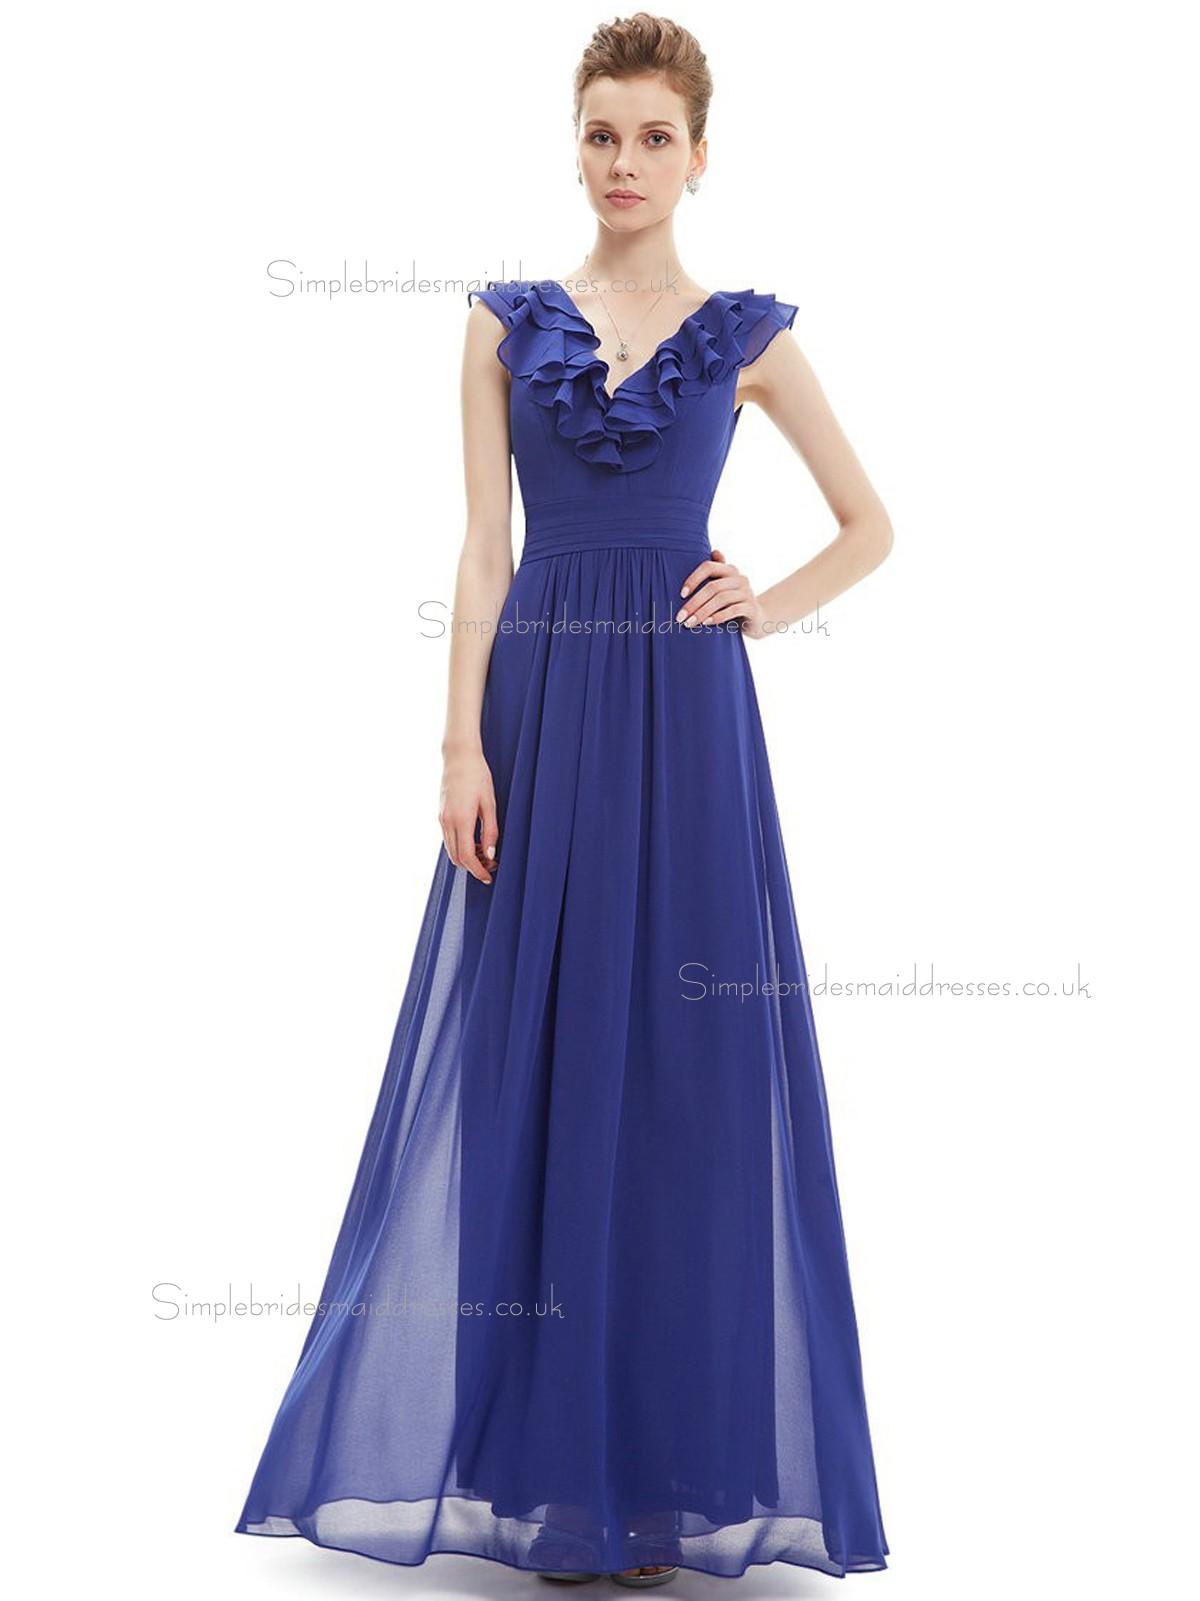 01a0ed495ae Romantica Blue Chiffon V-neck A-line Floor-length Tiered Natural Bridesmaid  Dress ...